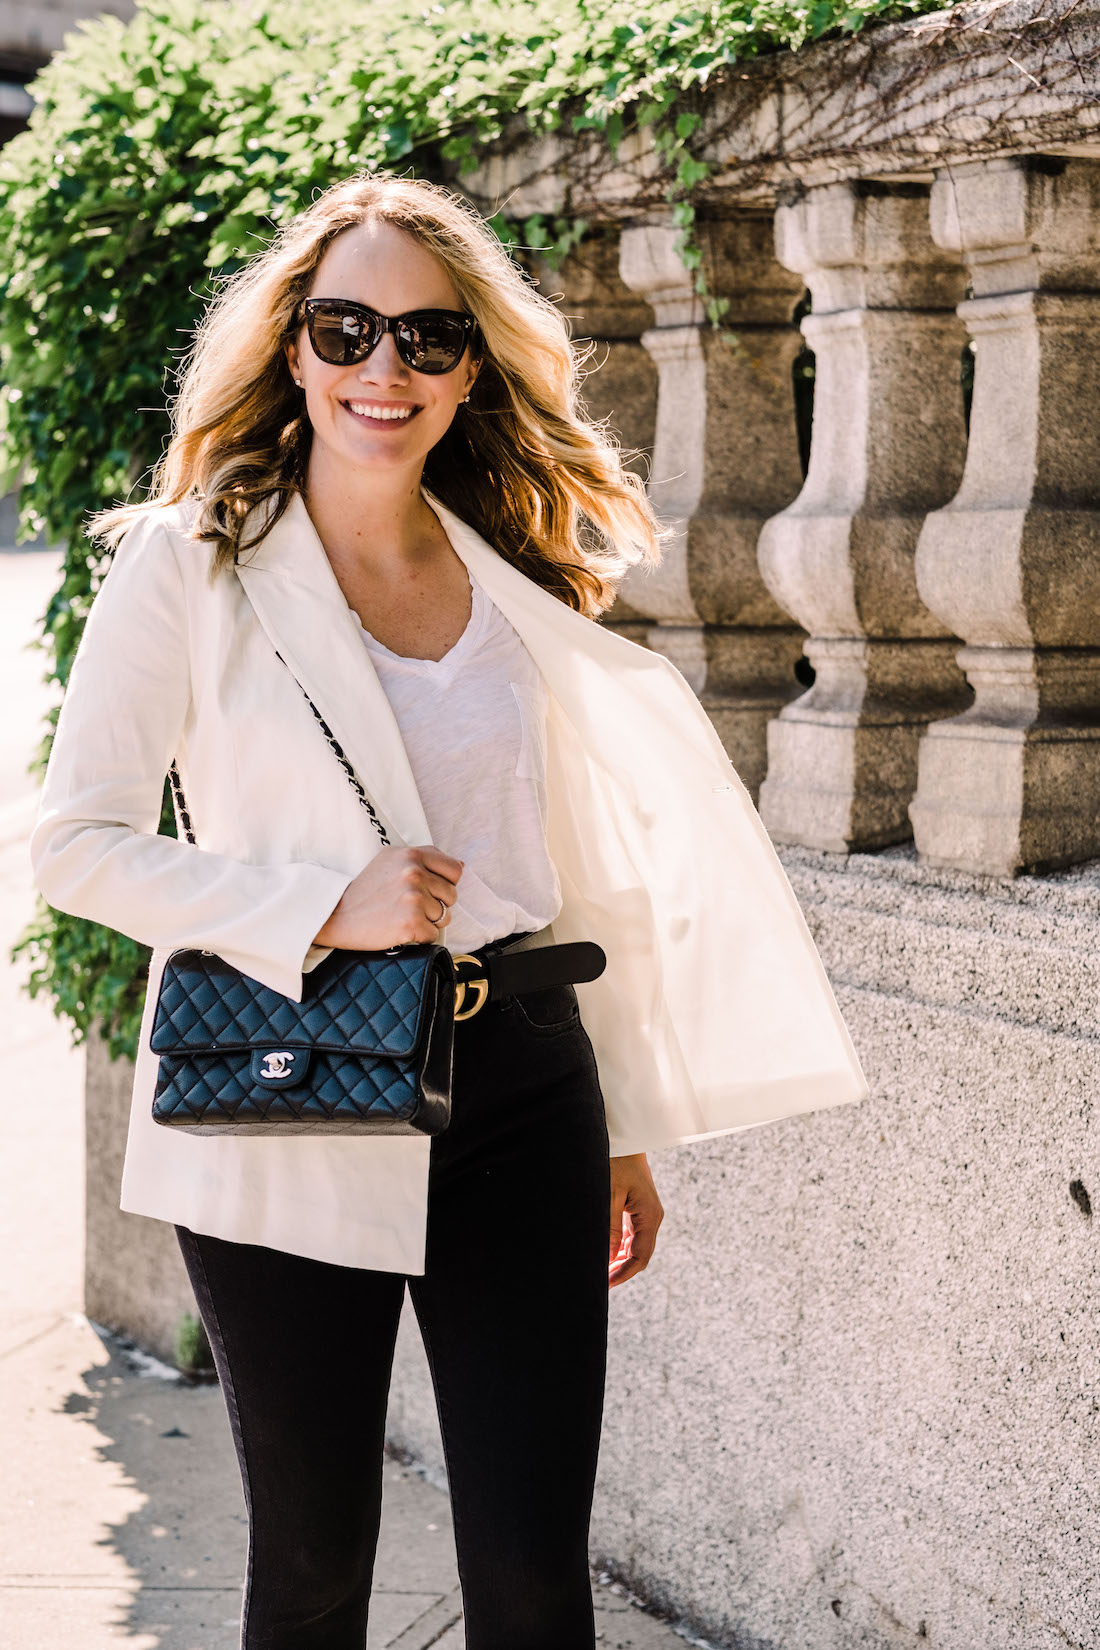 Outfit Details:Leith Blazer // Madewell Tee // American Eagle Jeans // Manolo Blahnik Heels // Gucci Belt // Chanel Purse // Polaroid Sunglasses // Monica Vinader Diamond Bracelet- The Stripe